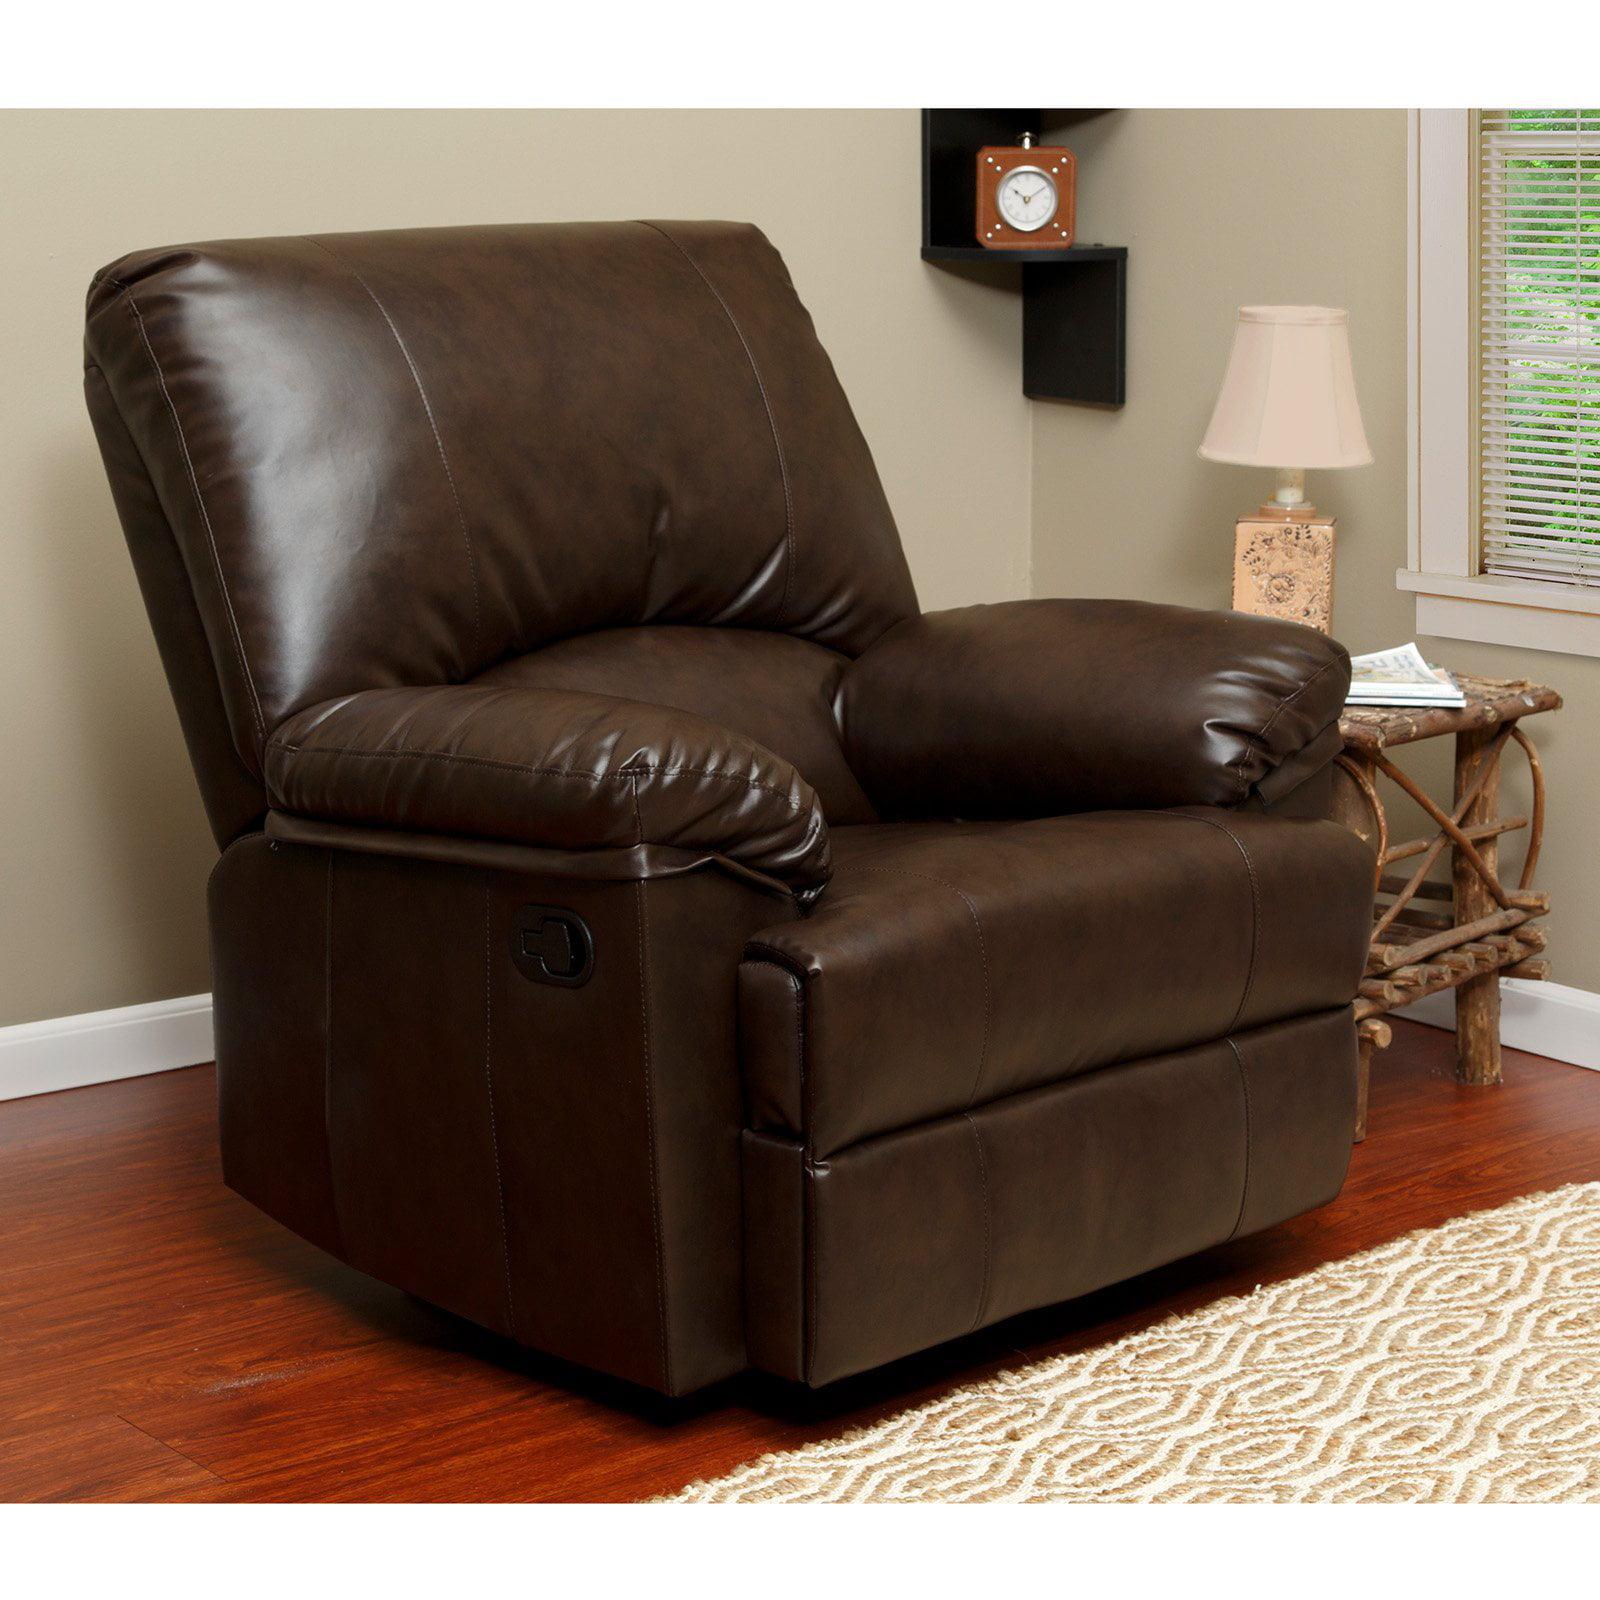 Comfort Products Relaxzen Rocker Recliner by Comfort Line Products